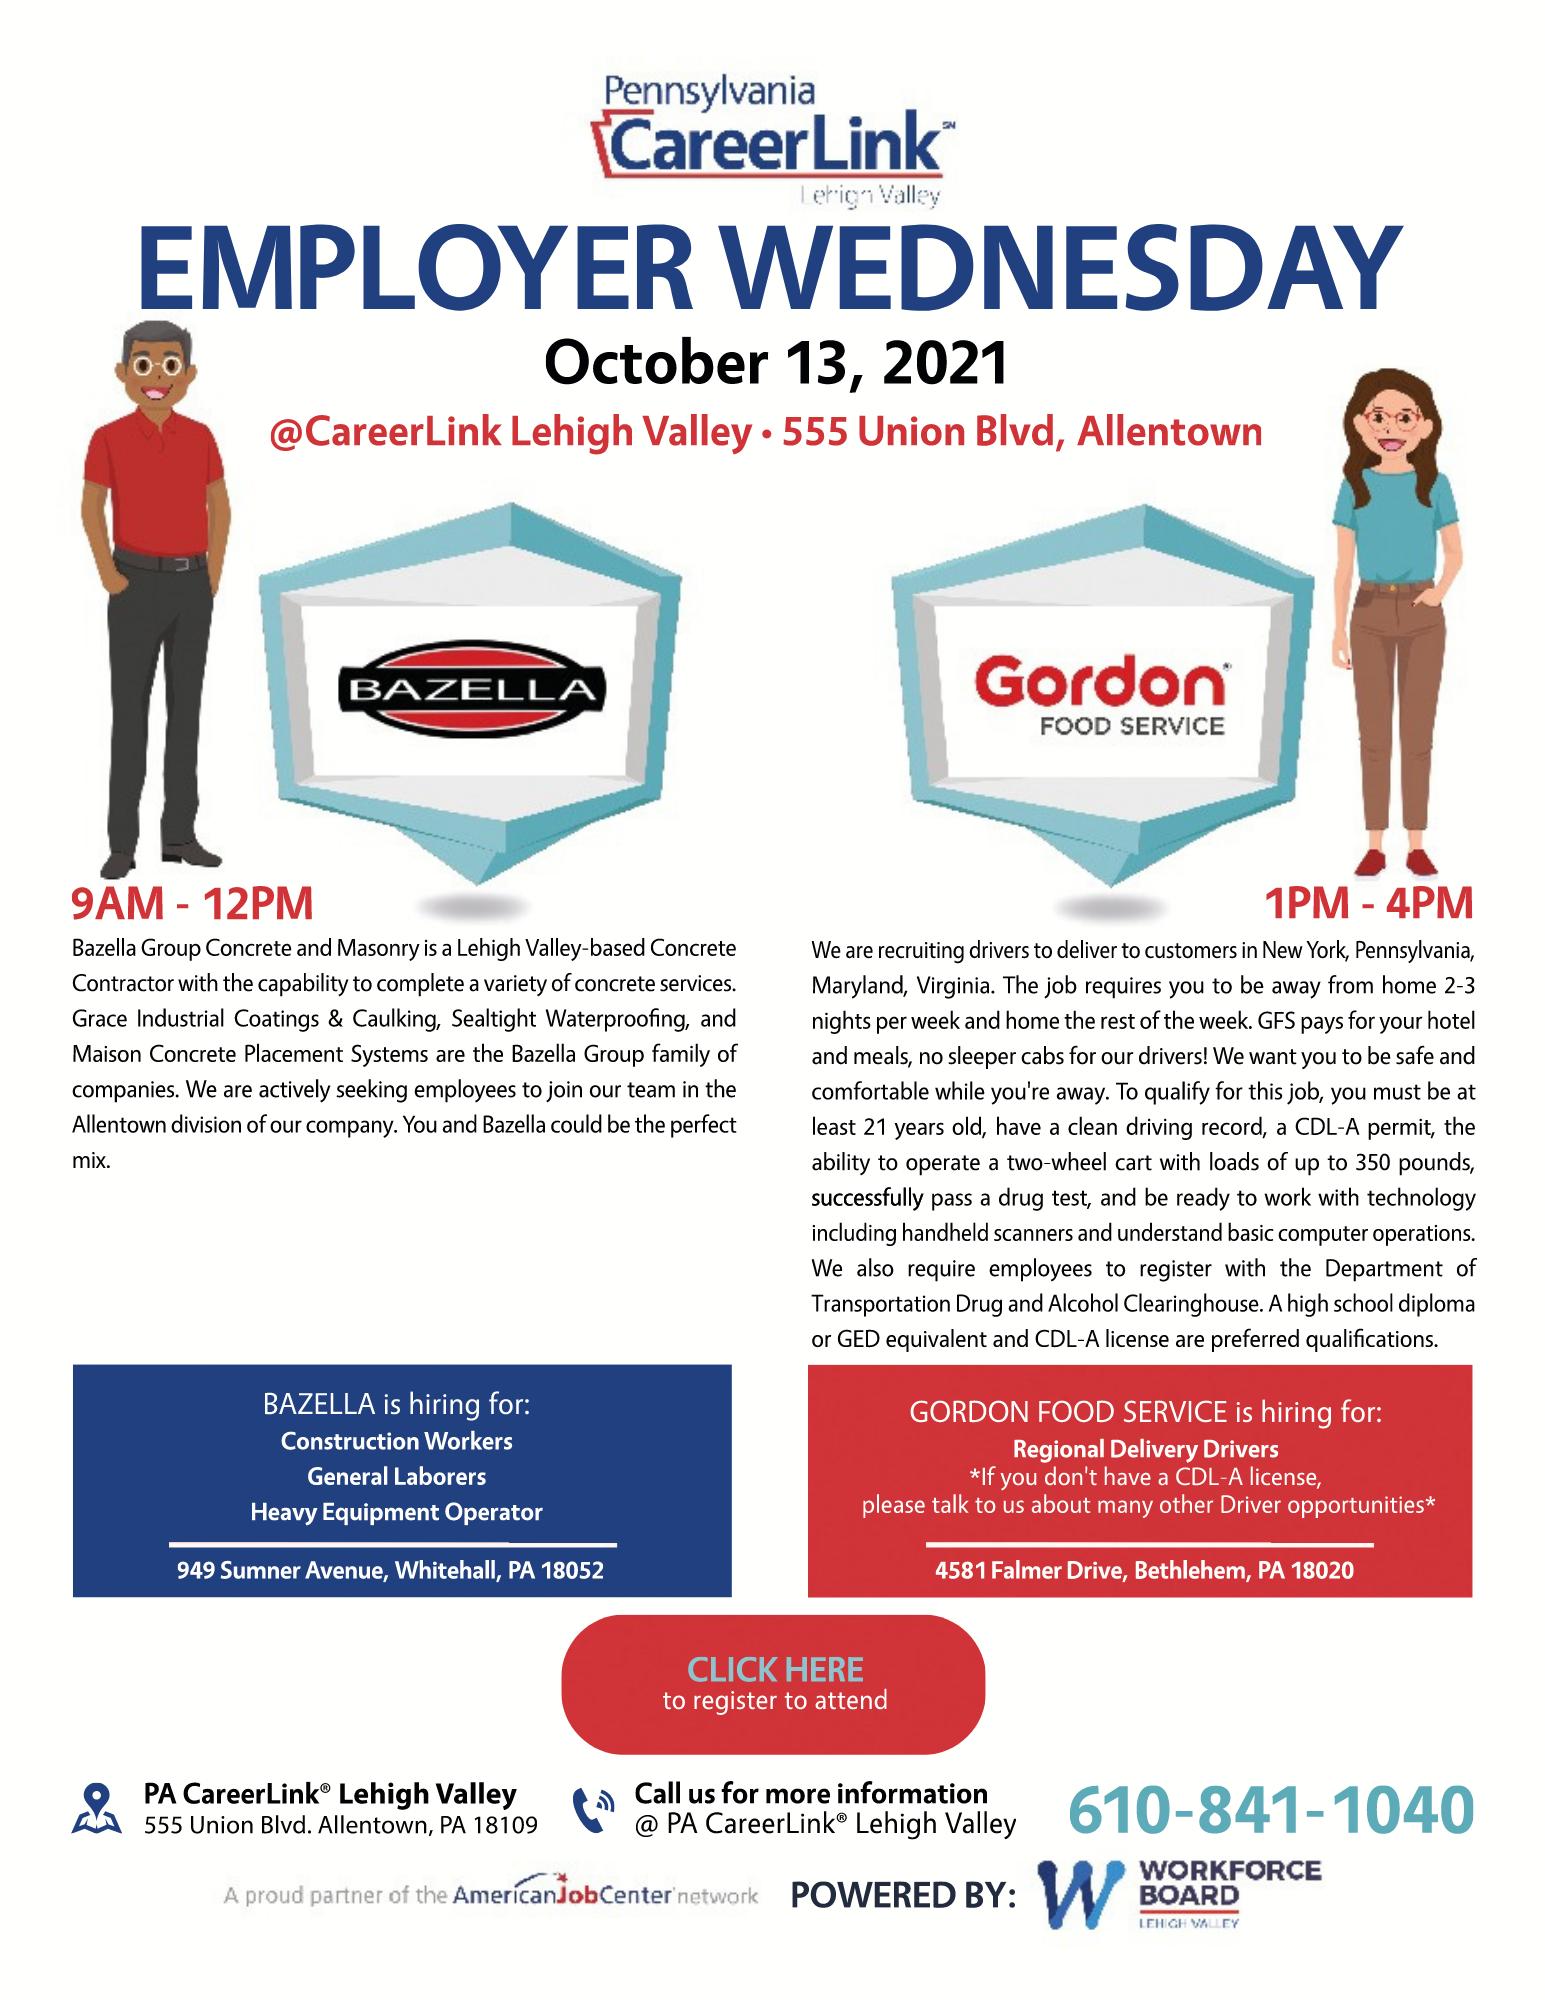 Employer Wednesday flyer October 13